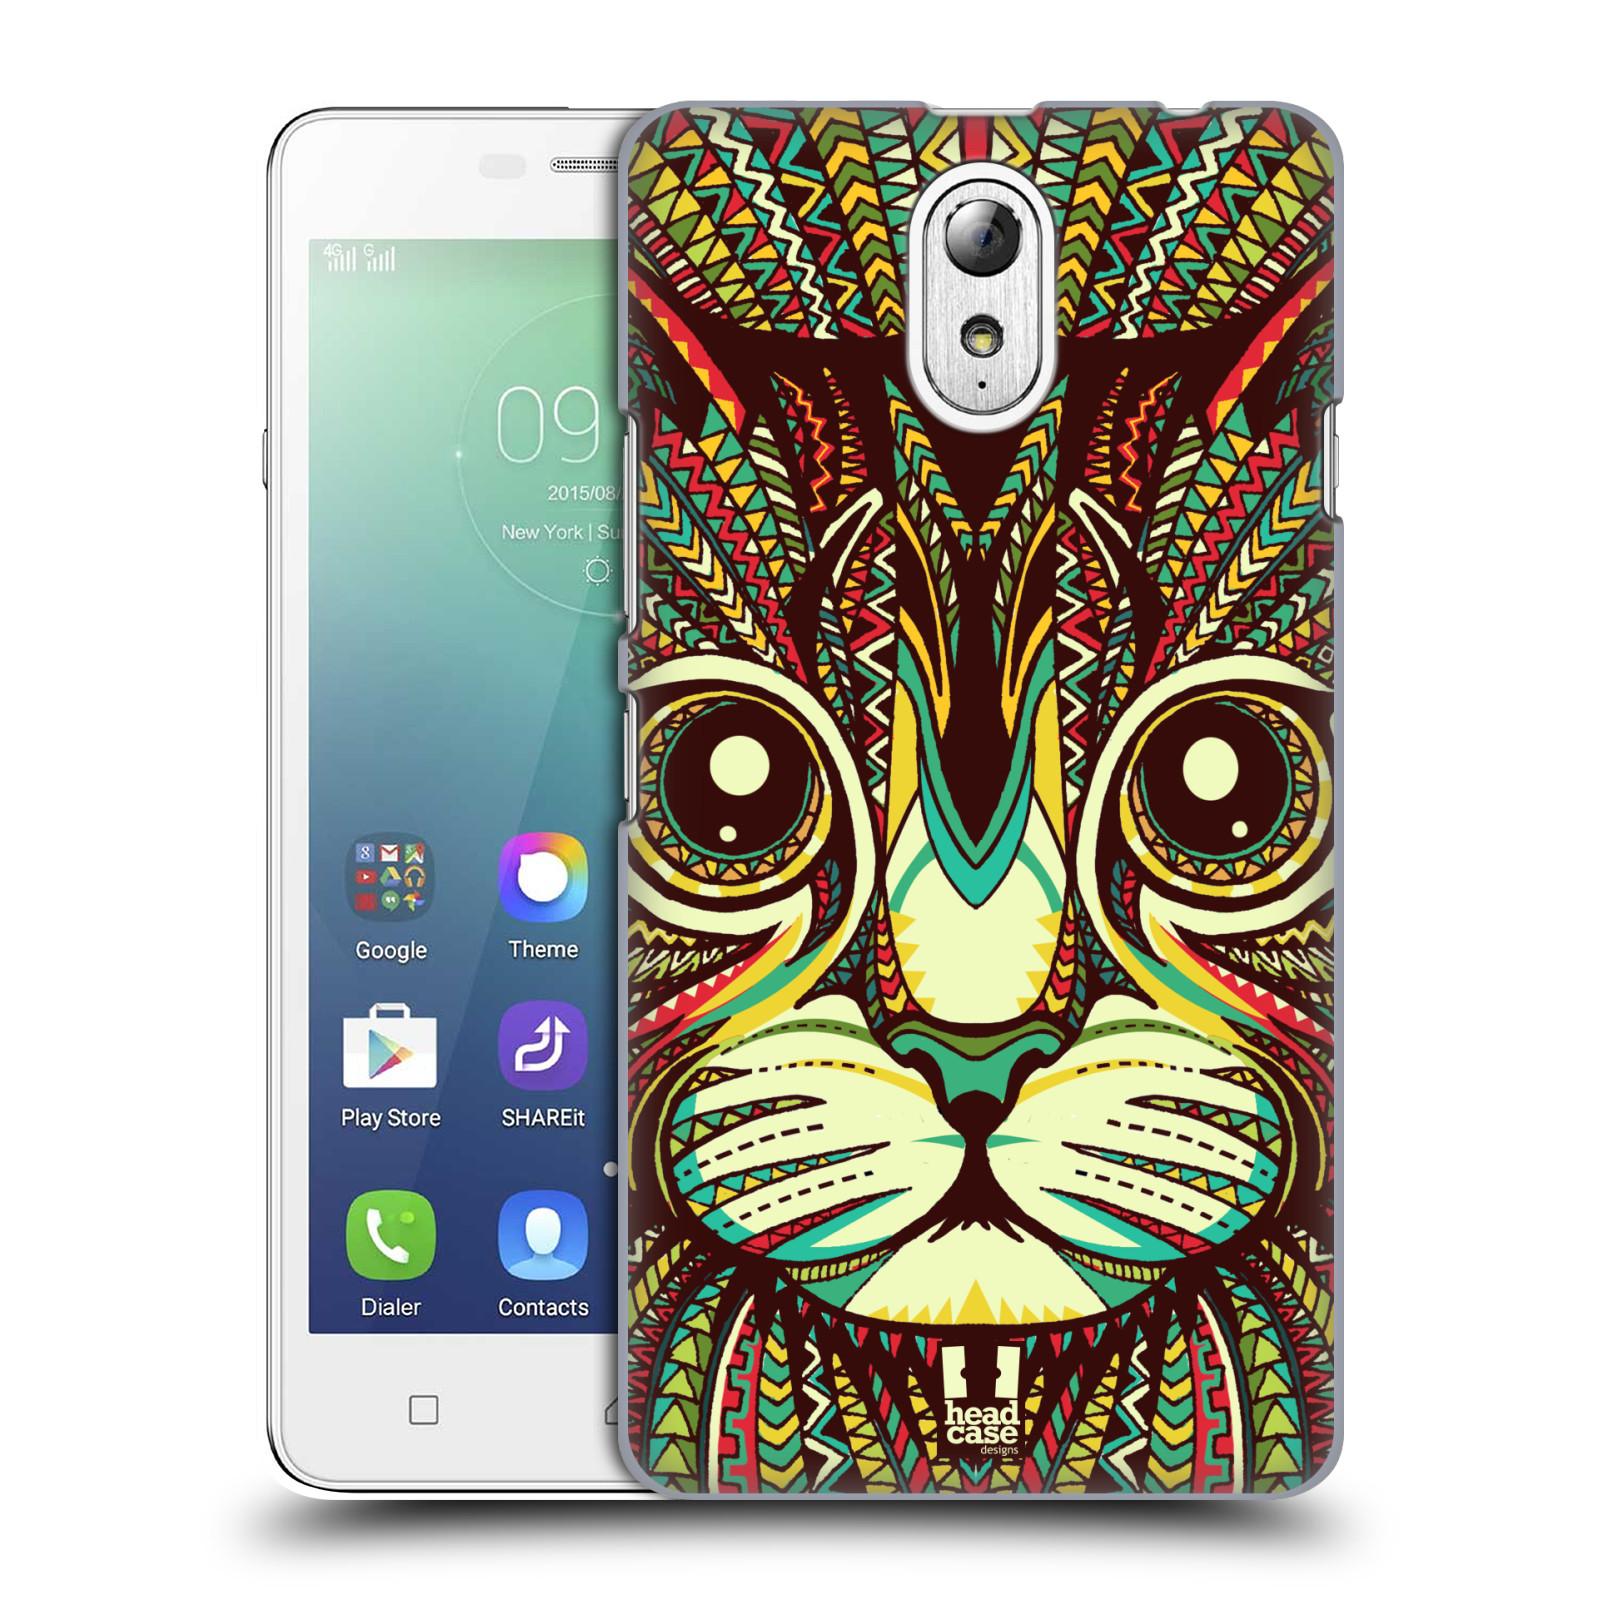 HEAD CASE pevný plastový obal na mobil LENOVO VIBE P1m / LENOVO VIBE p1m DUAL SIM vzor Aztécký motiv zvíře 2 kotě